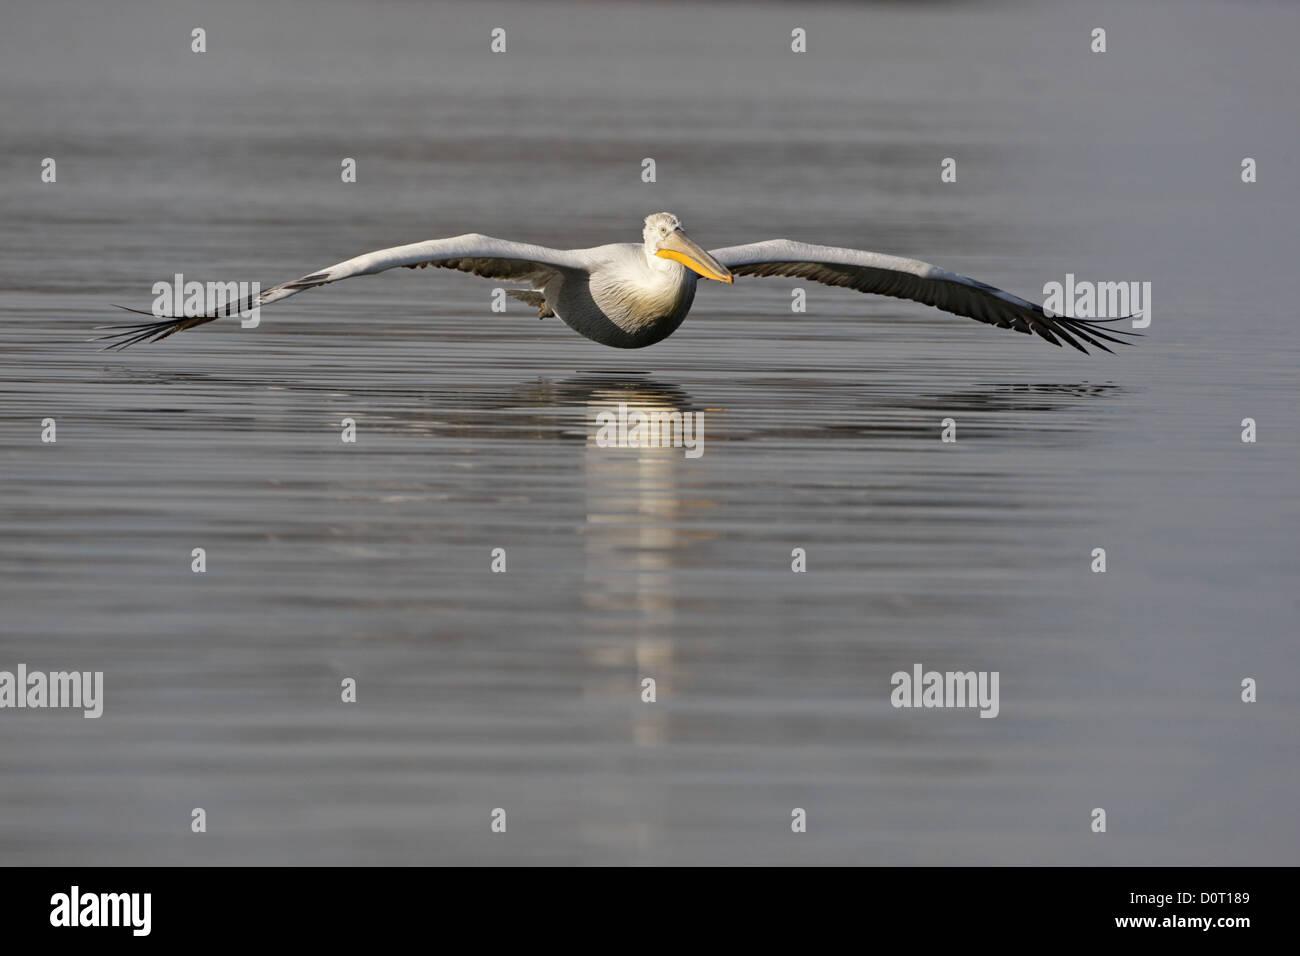 dalmatian pelican flighting, Pelicanus crispus, Kerkini Lake, Greece - Stock Image